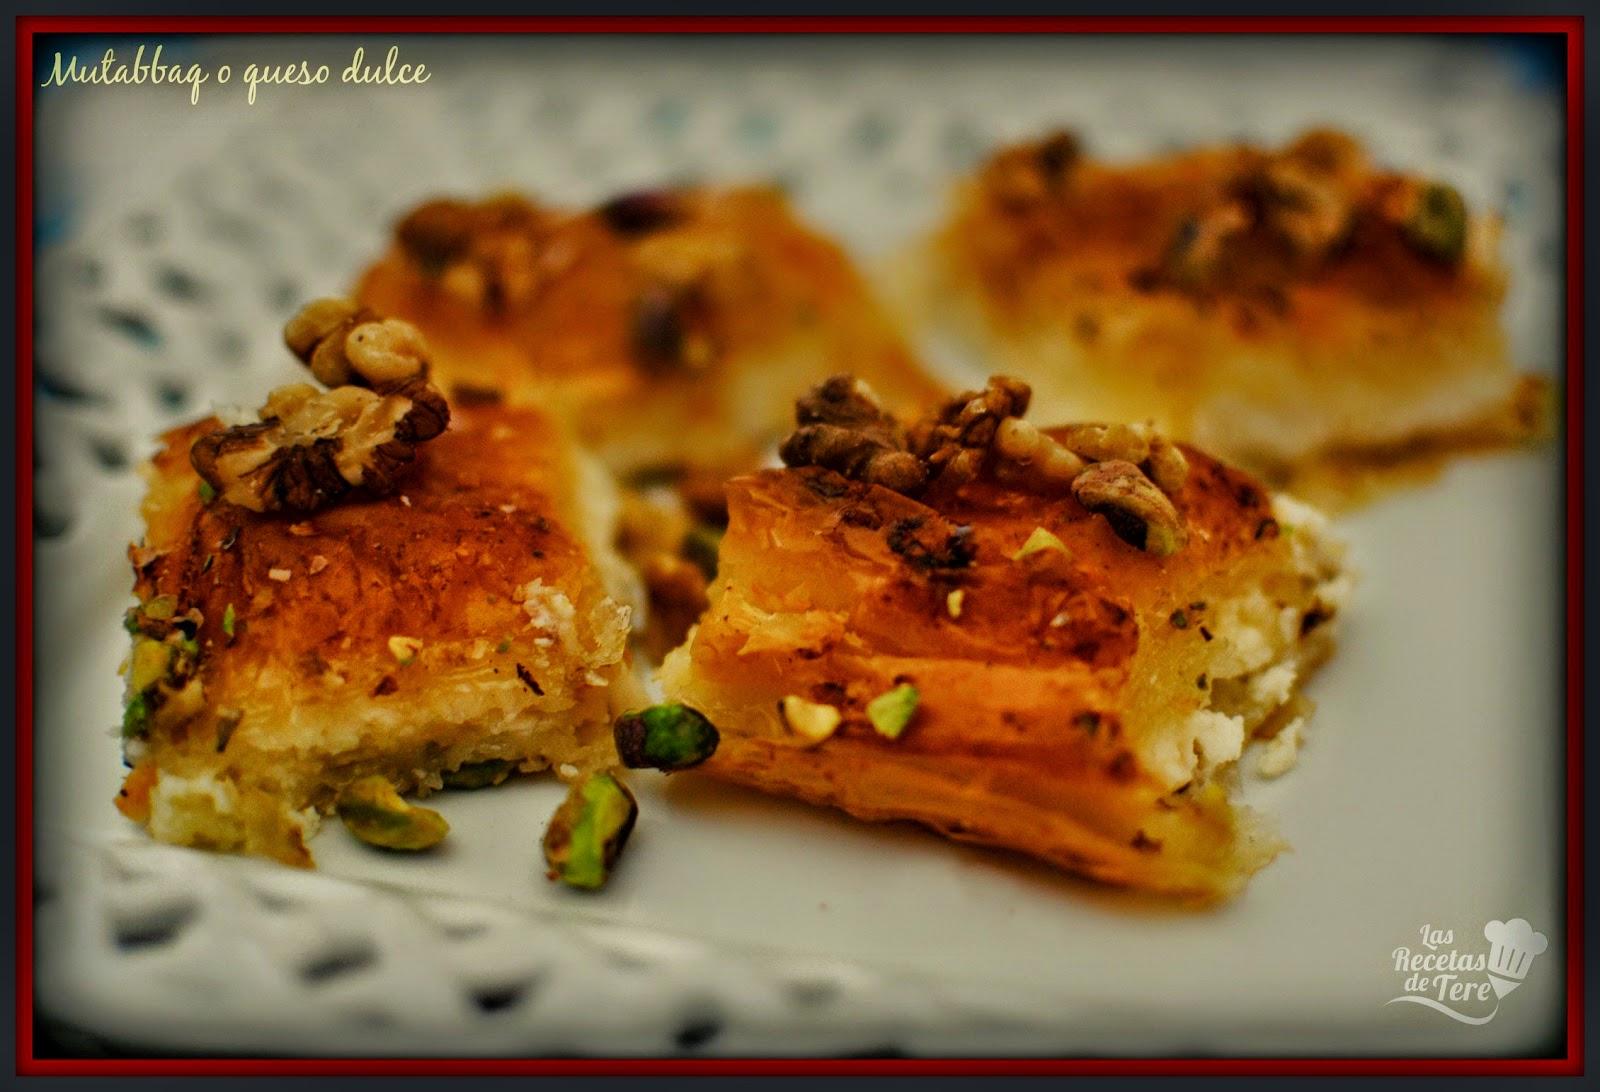 mutabbaq o queso dulce tererecetas 07